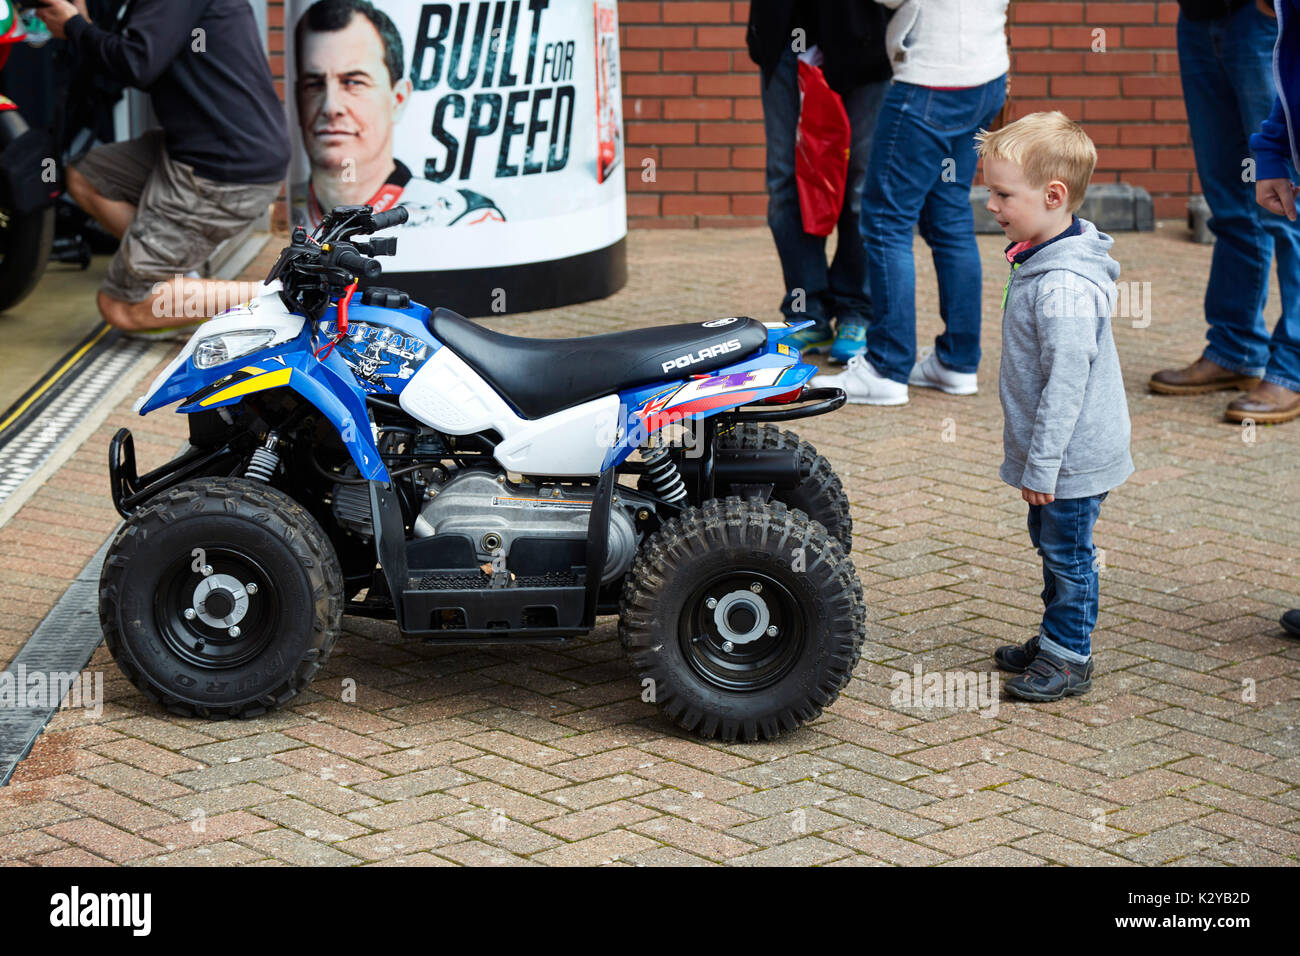 Small boy looks on at John McGuinness' mini quad bike at the Manx Classic TT races, Isle of Man - Stock Image